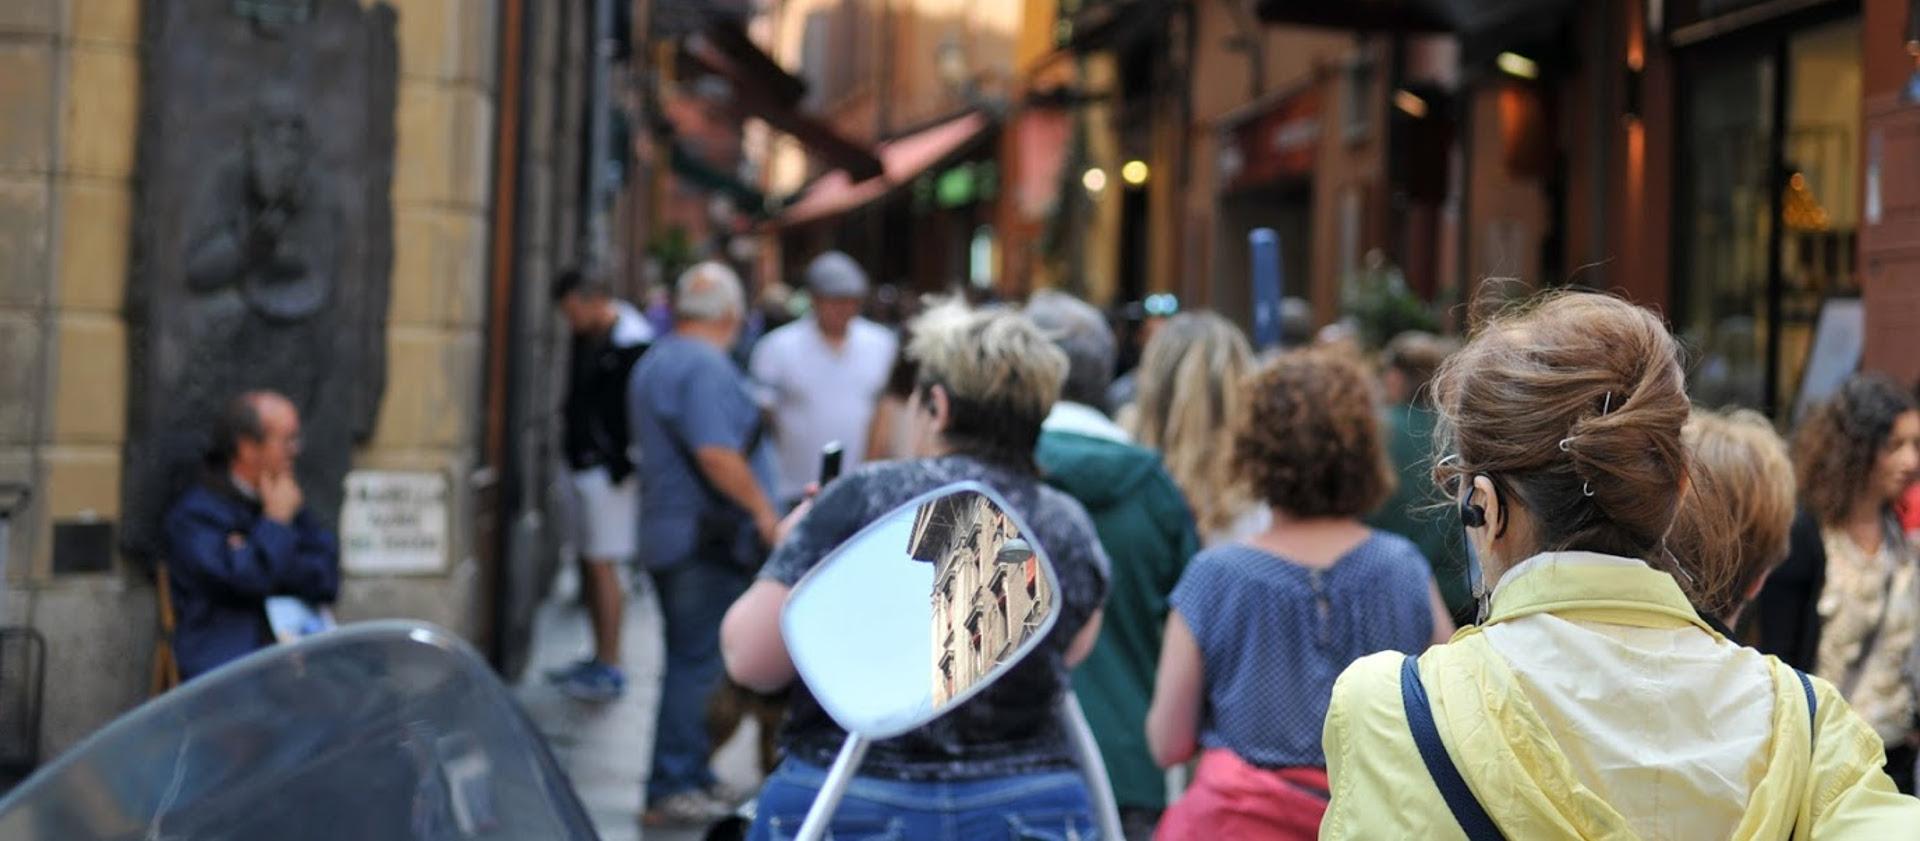 Gente in città - Archivio Città metropolitana di Bologna